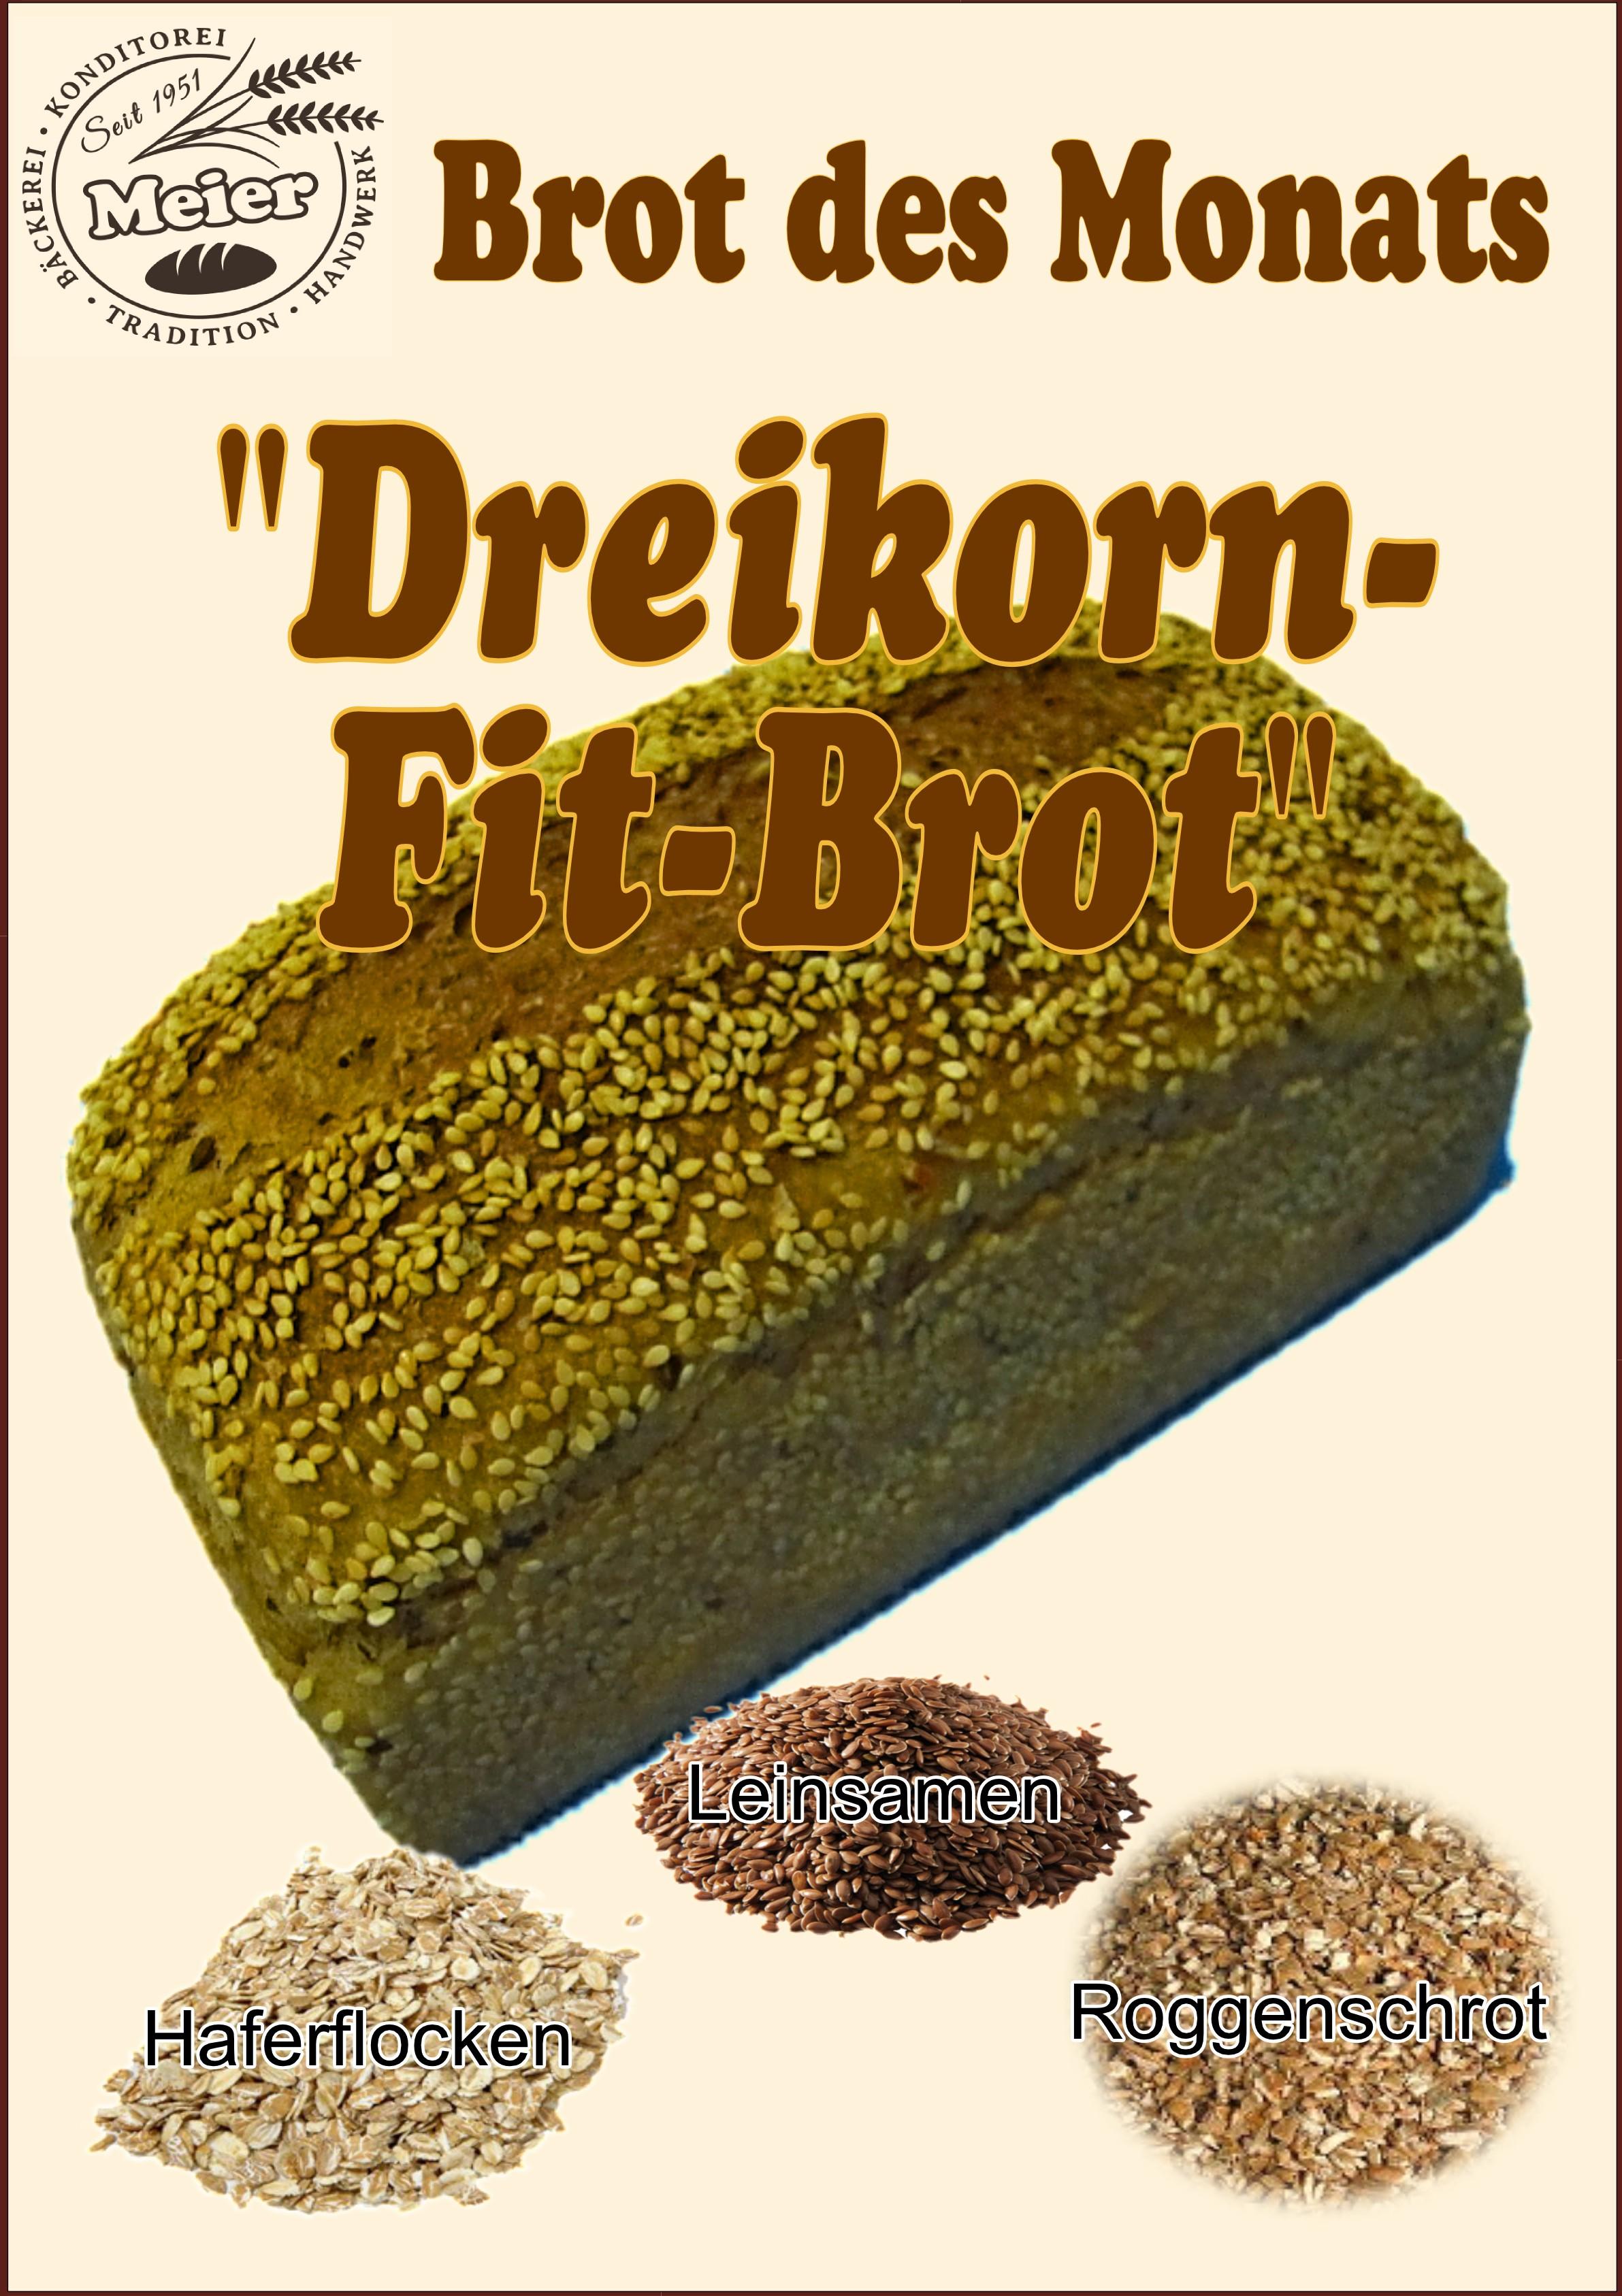 DreikornFitbrot